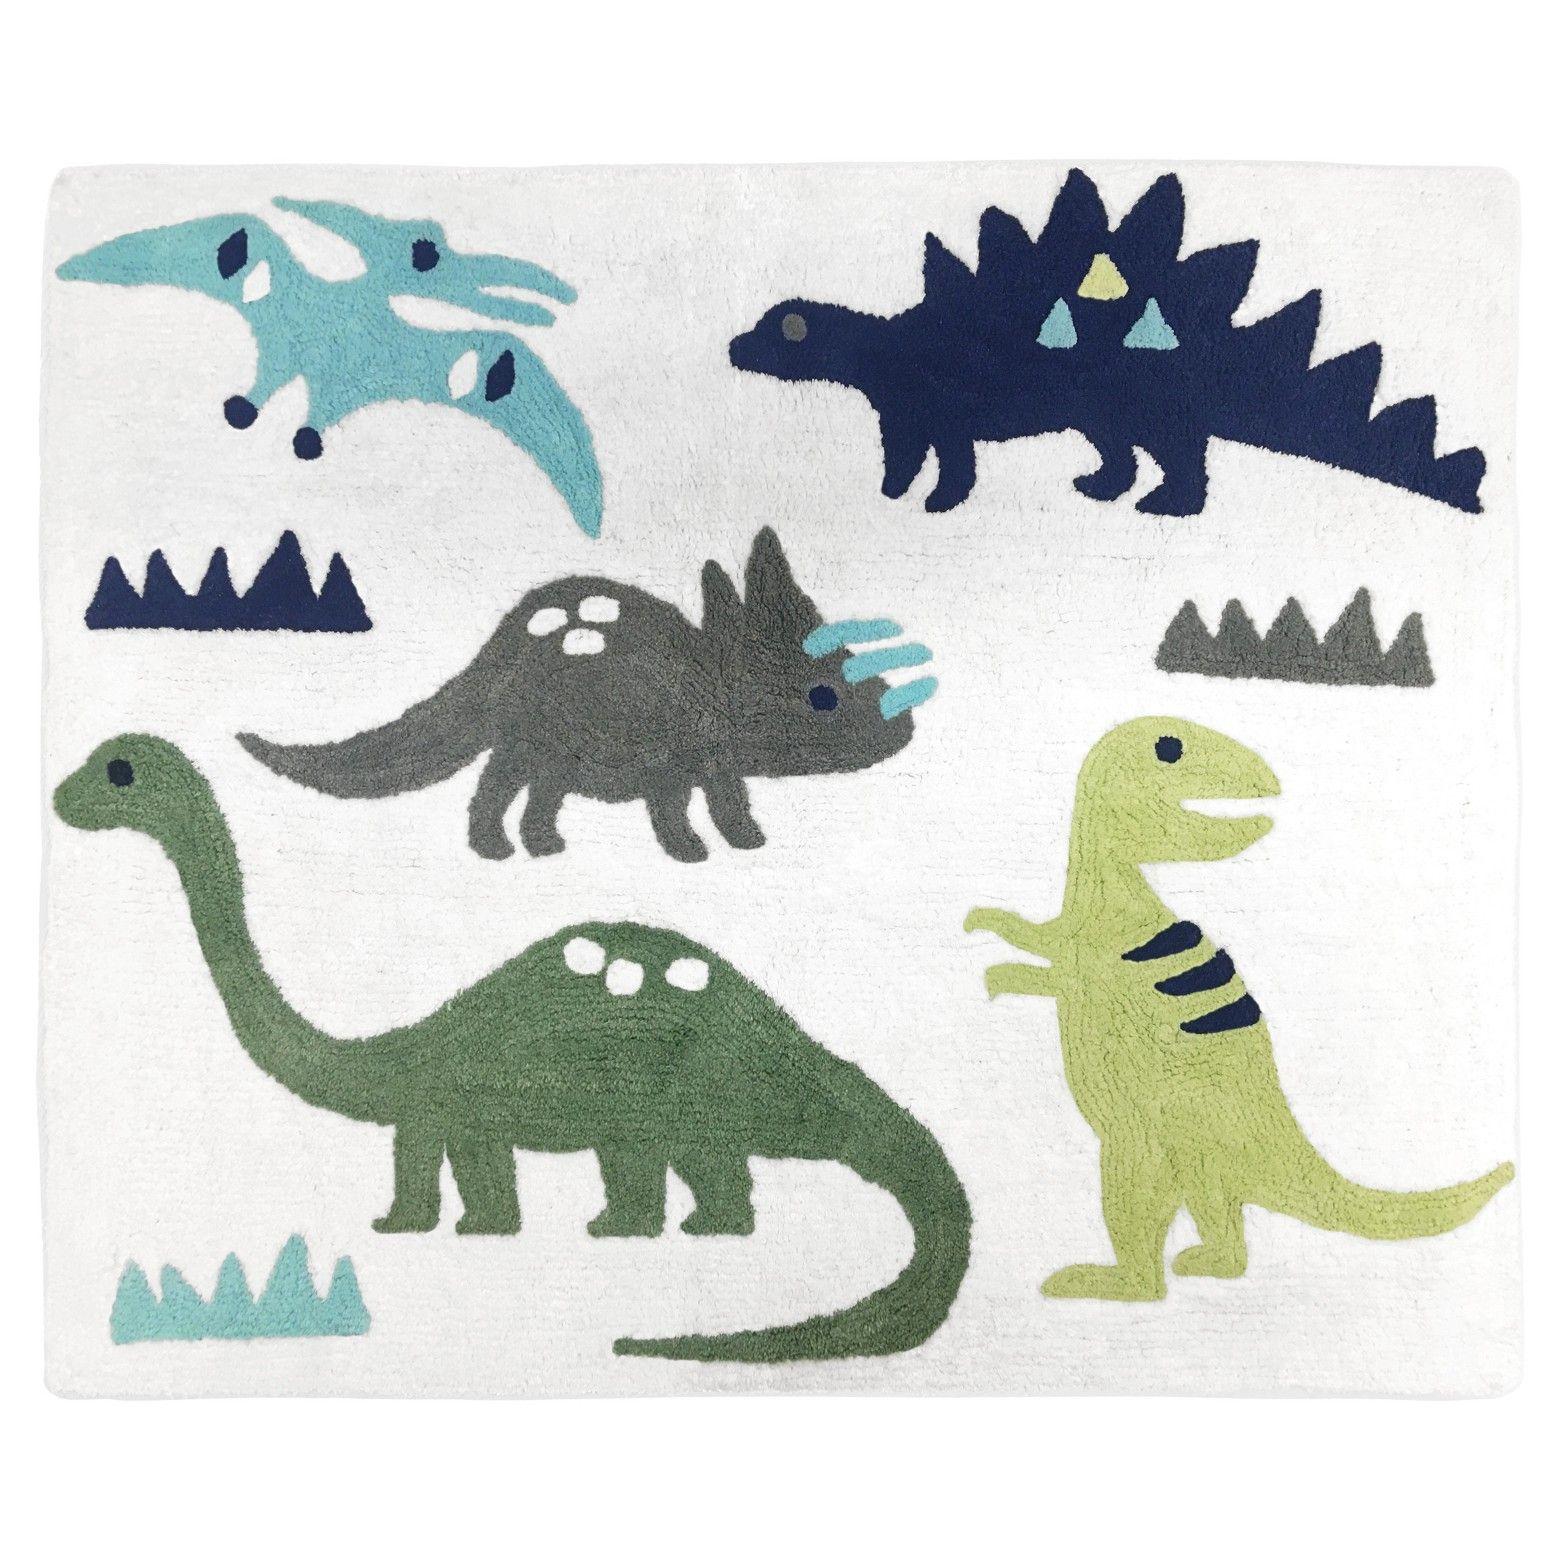 Green Blue Dinosaur Rug 2 X3 Sweet Jojo Designs Dinosaur Rug Blue Gray Area Rug Dinosaur Bedding